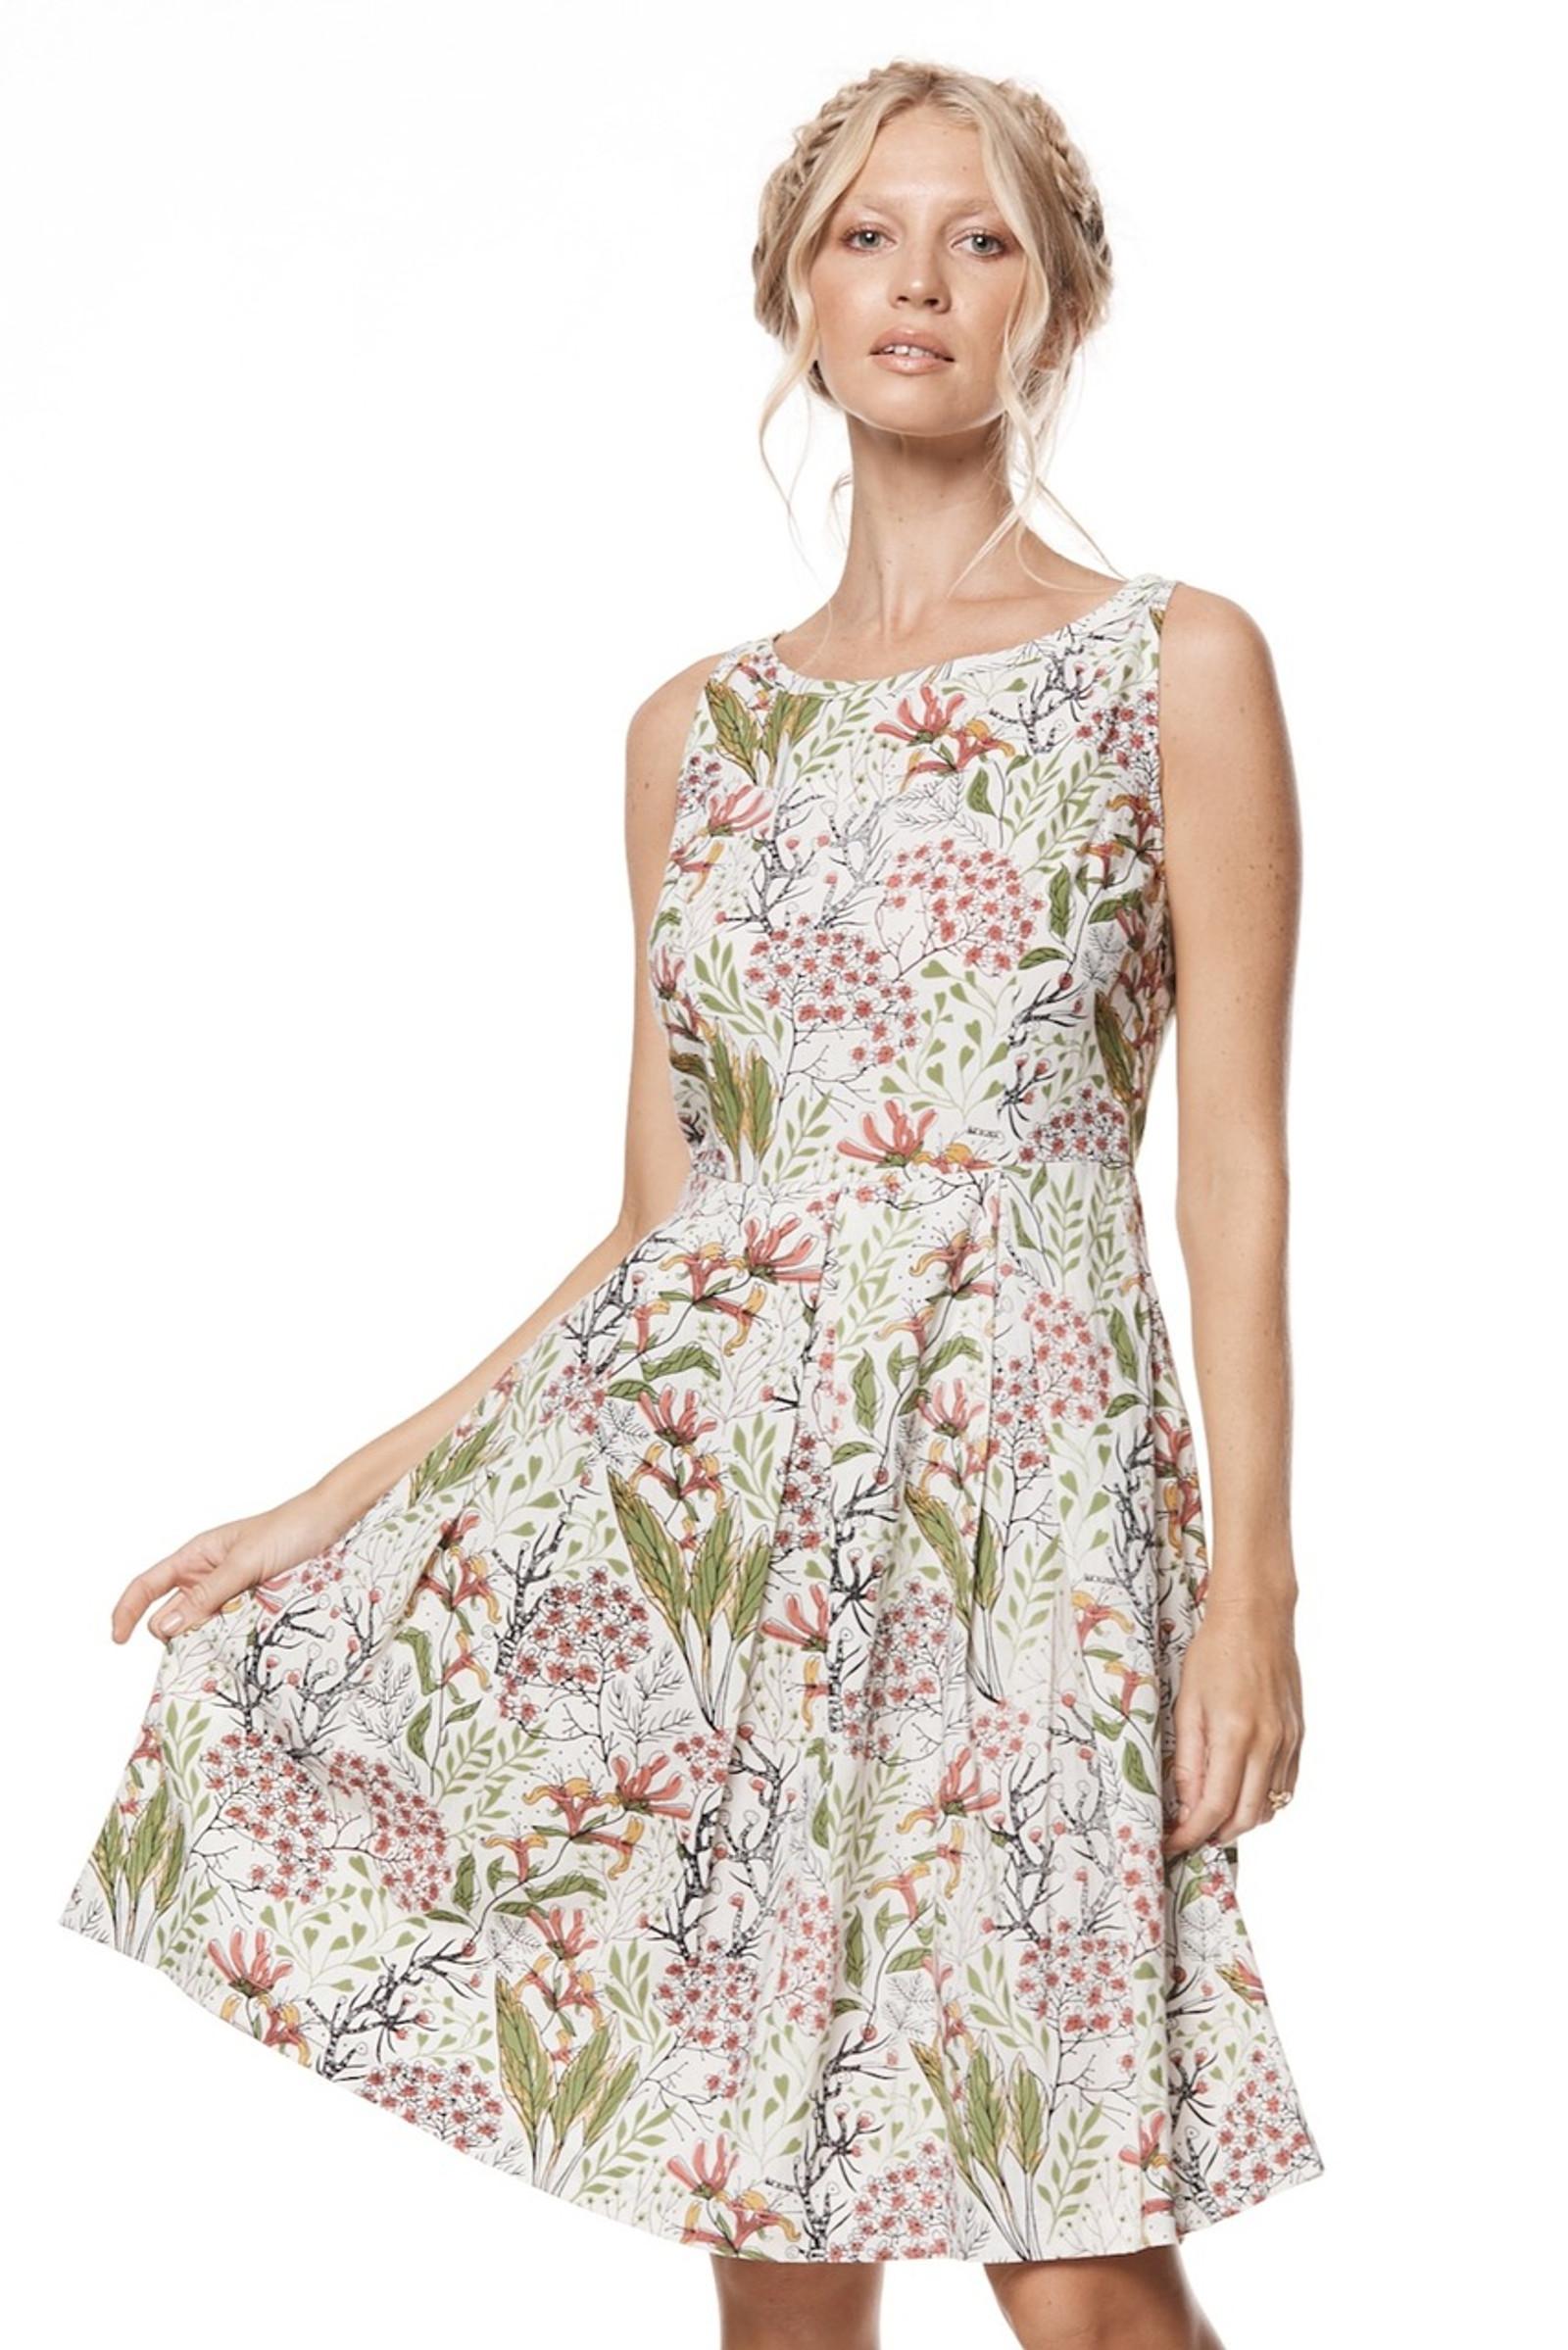 April Dress - Freesia